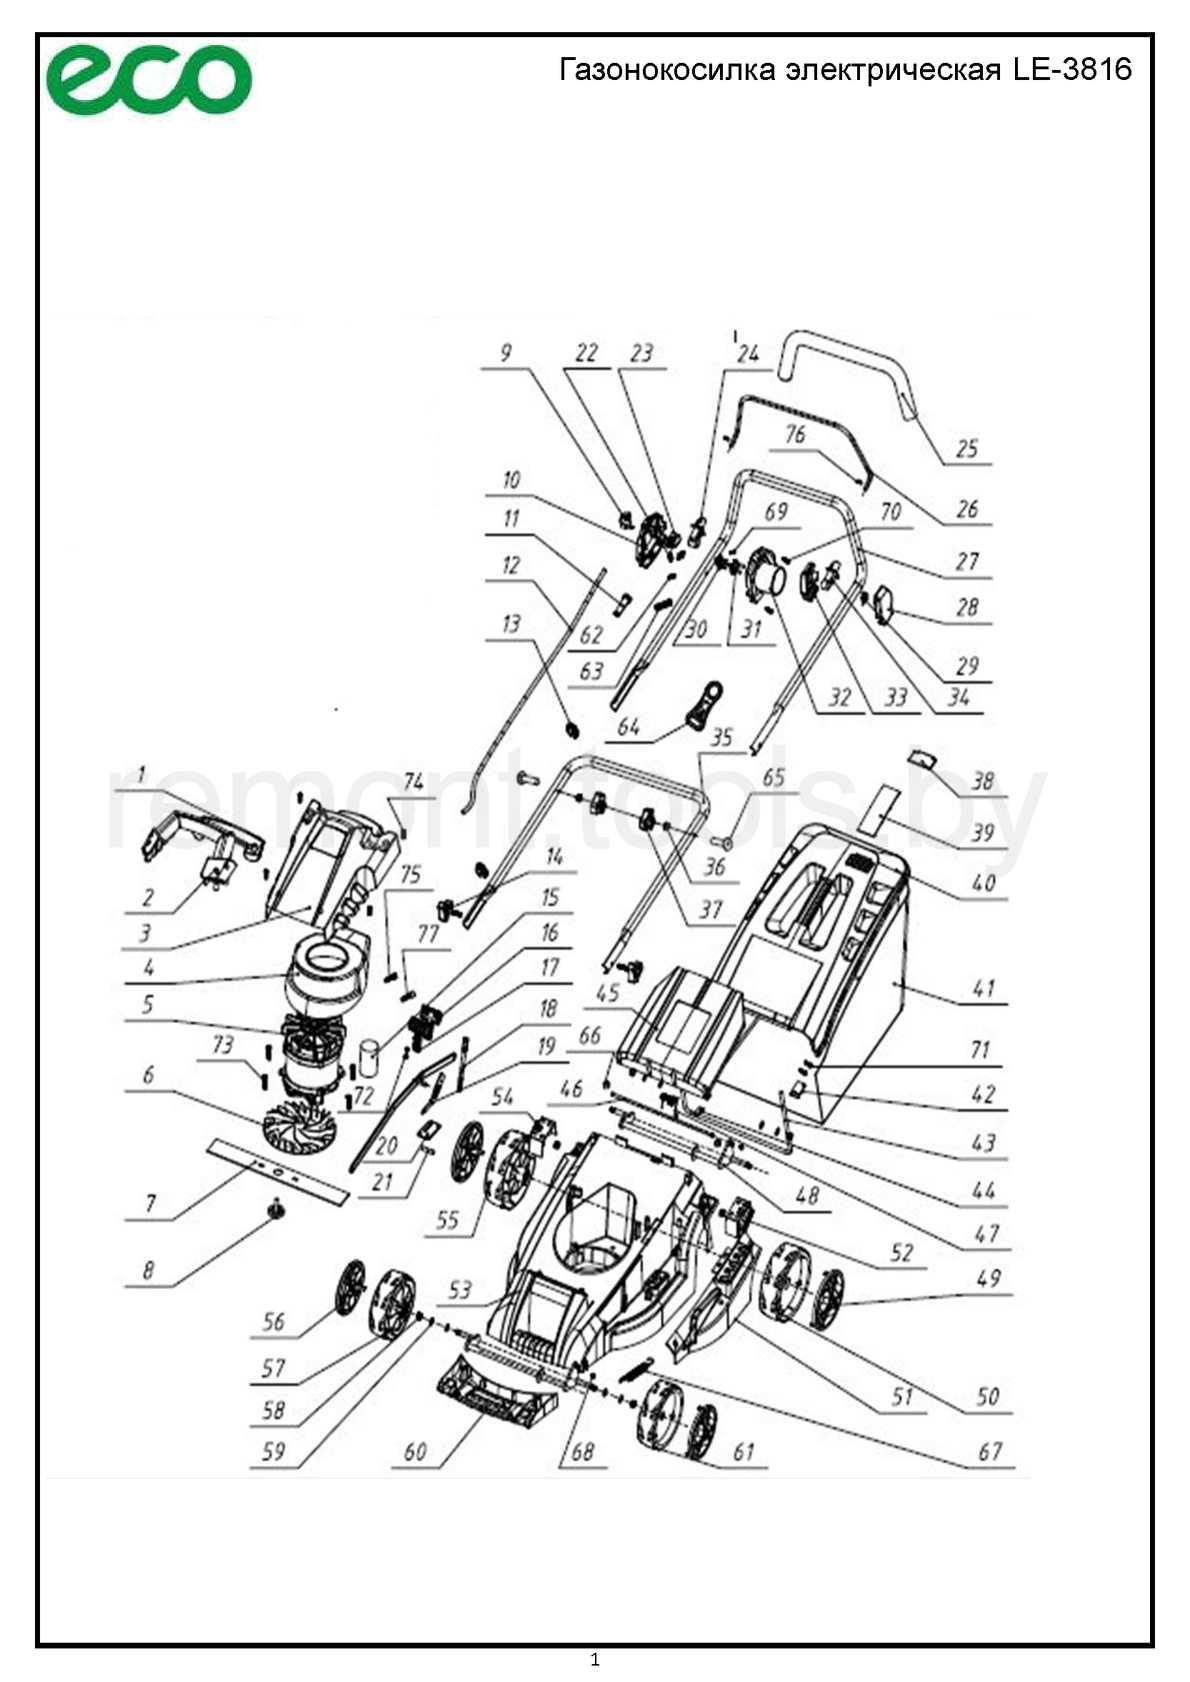 Eco Газонокосилка электрическая Le 3816